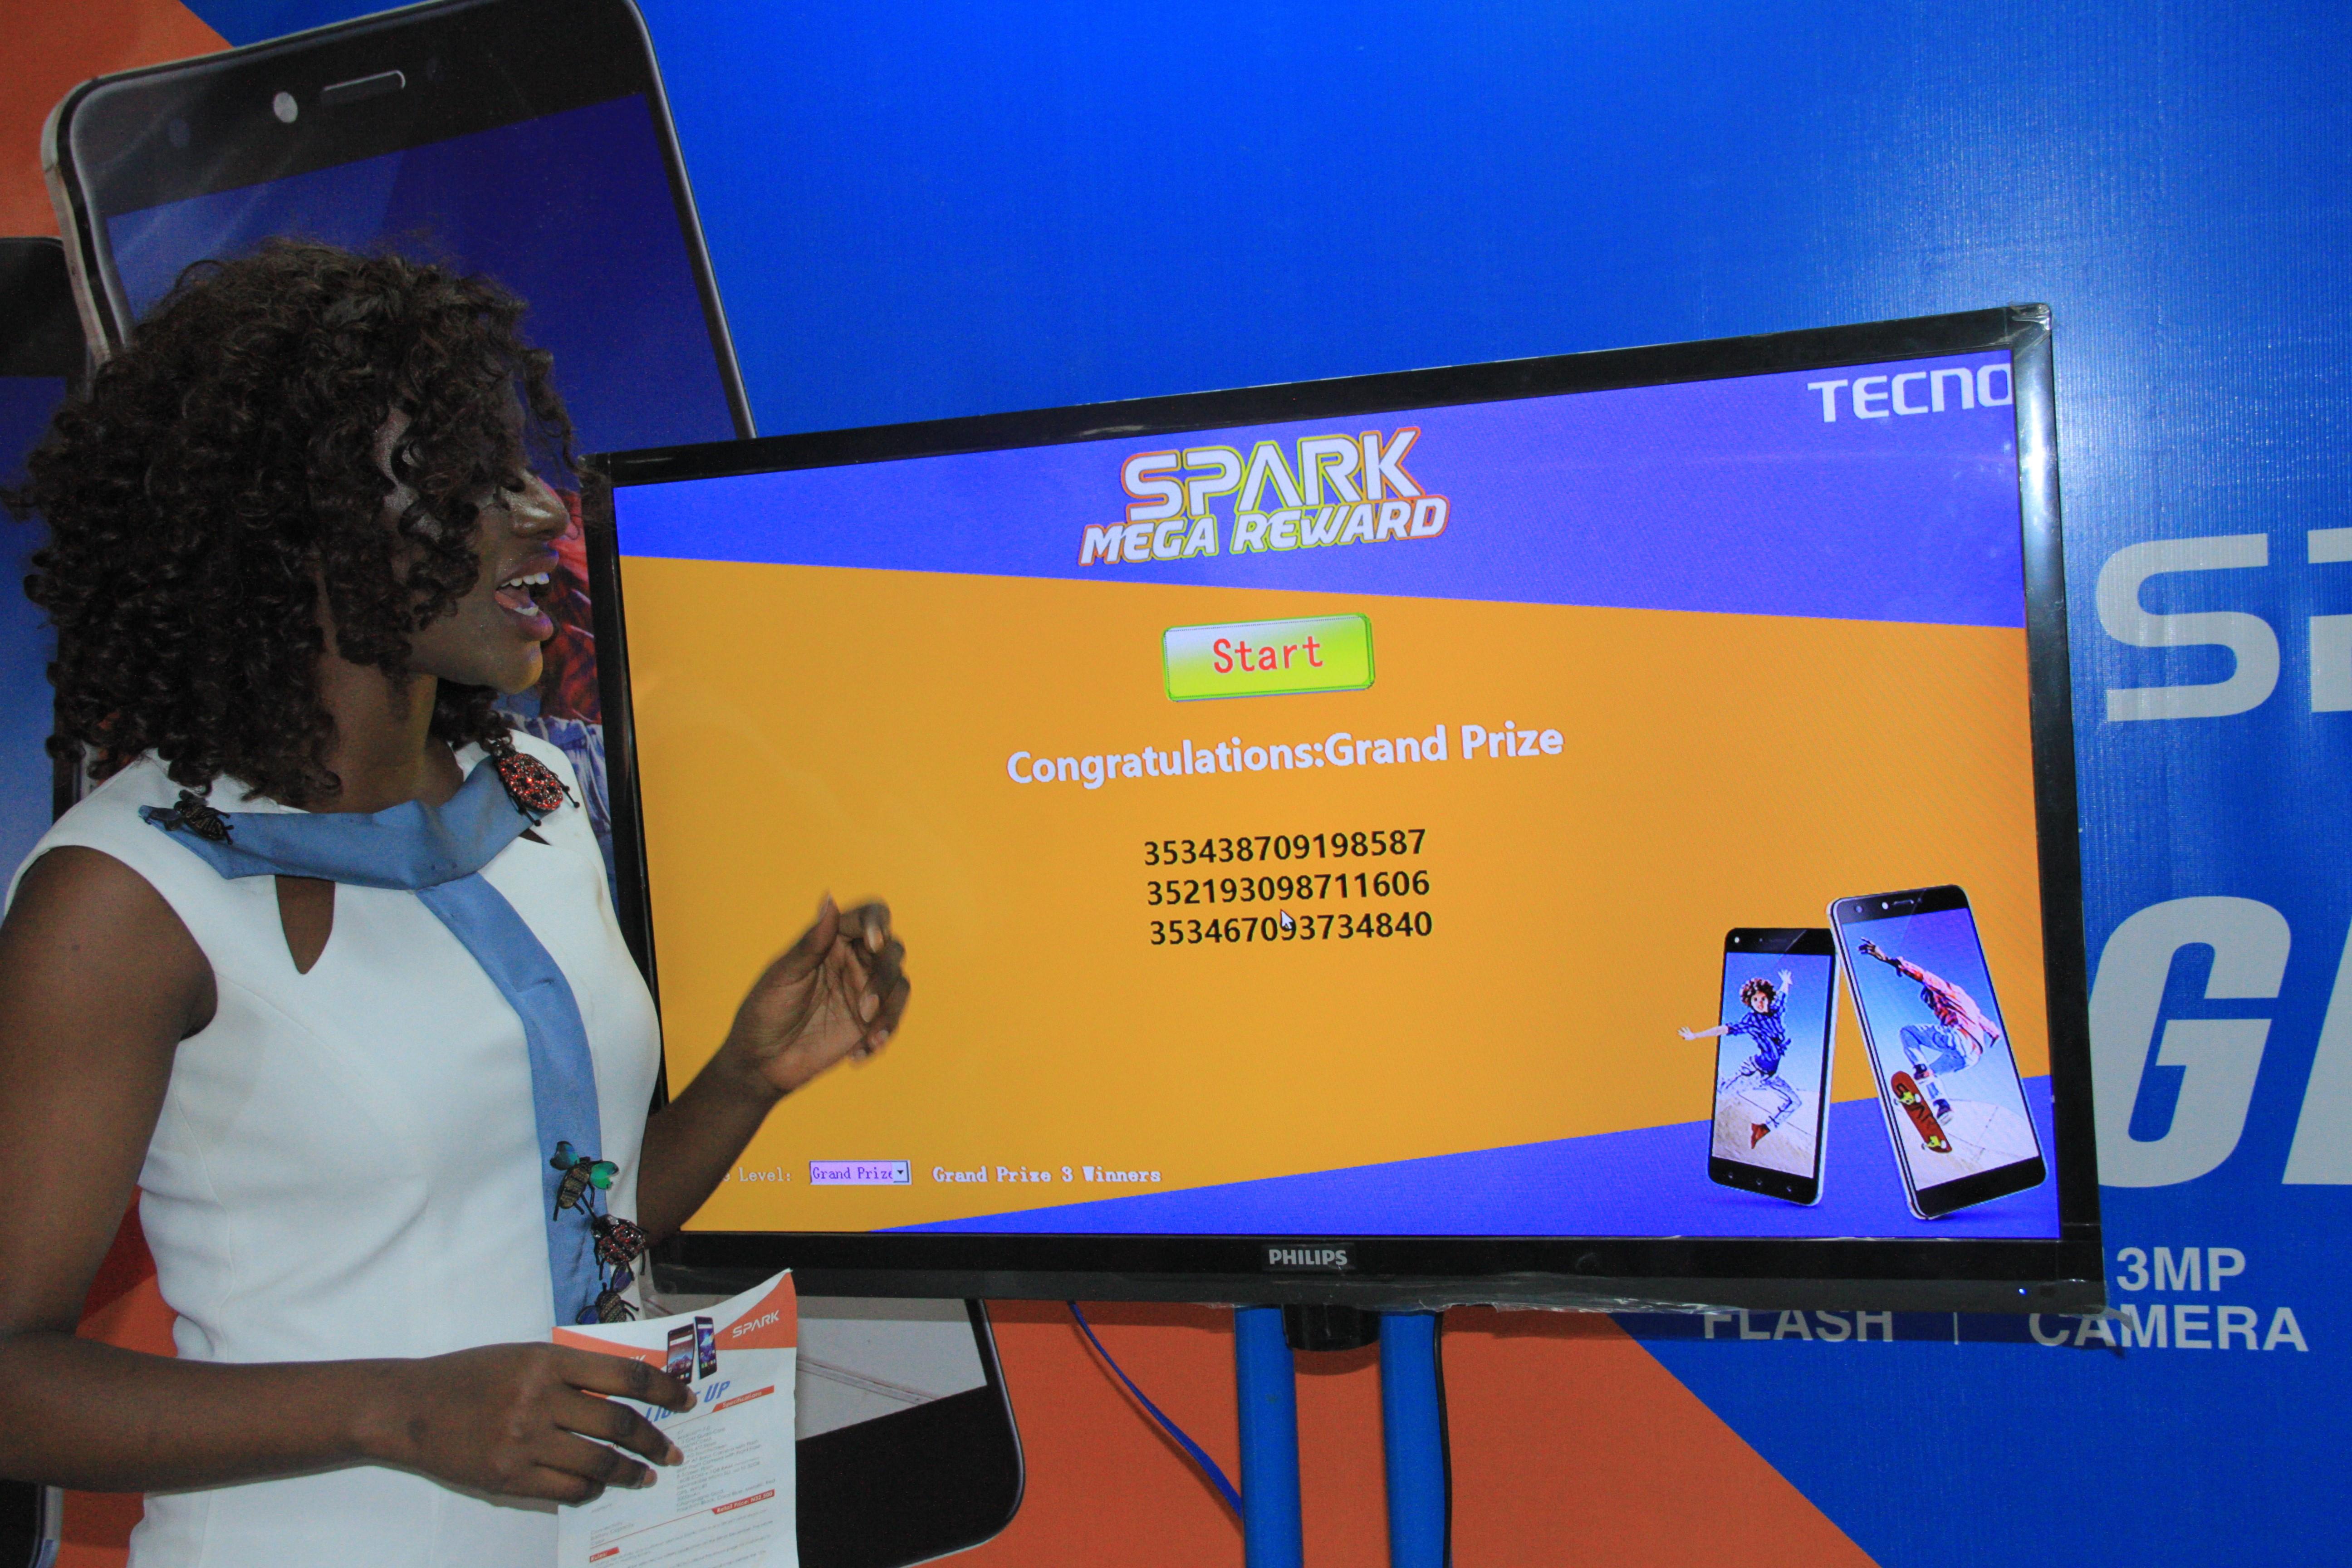 Tecno Mobile Rewards Fans With Fantastic Prizes In The Spark Mega Reward Bonanza